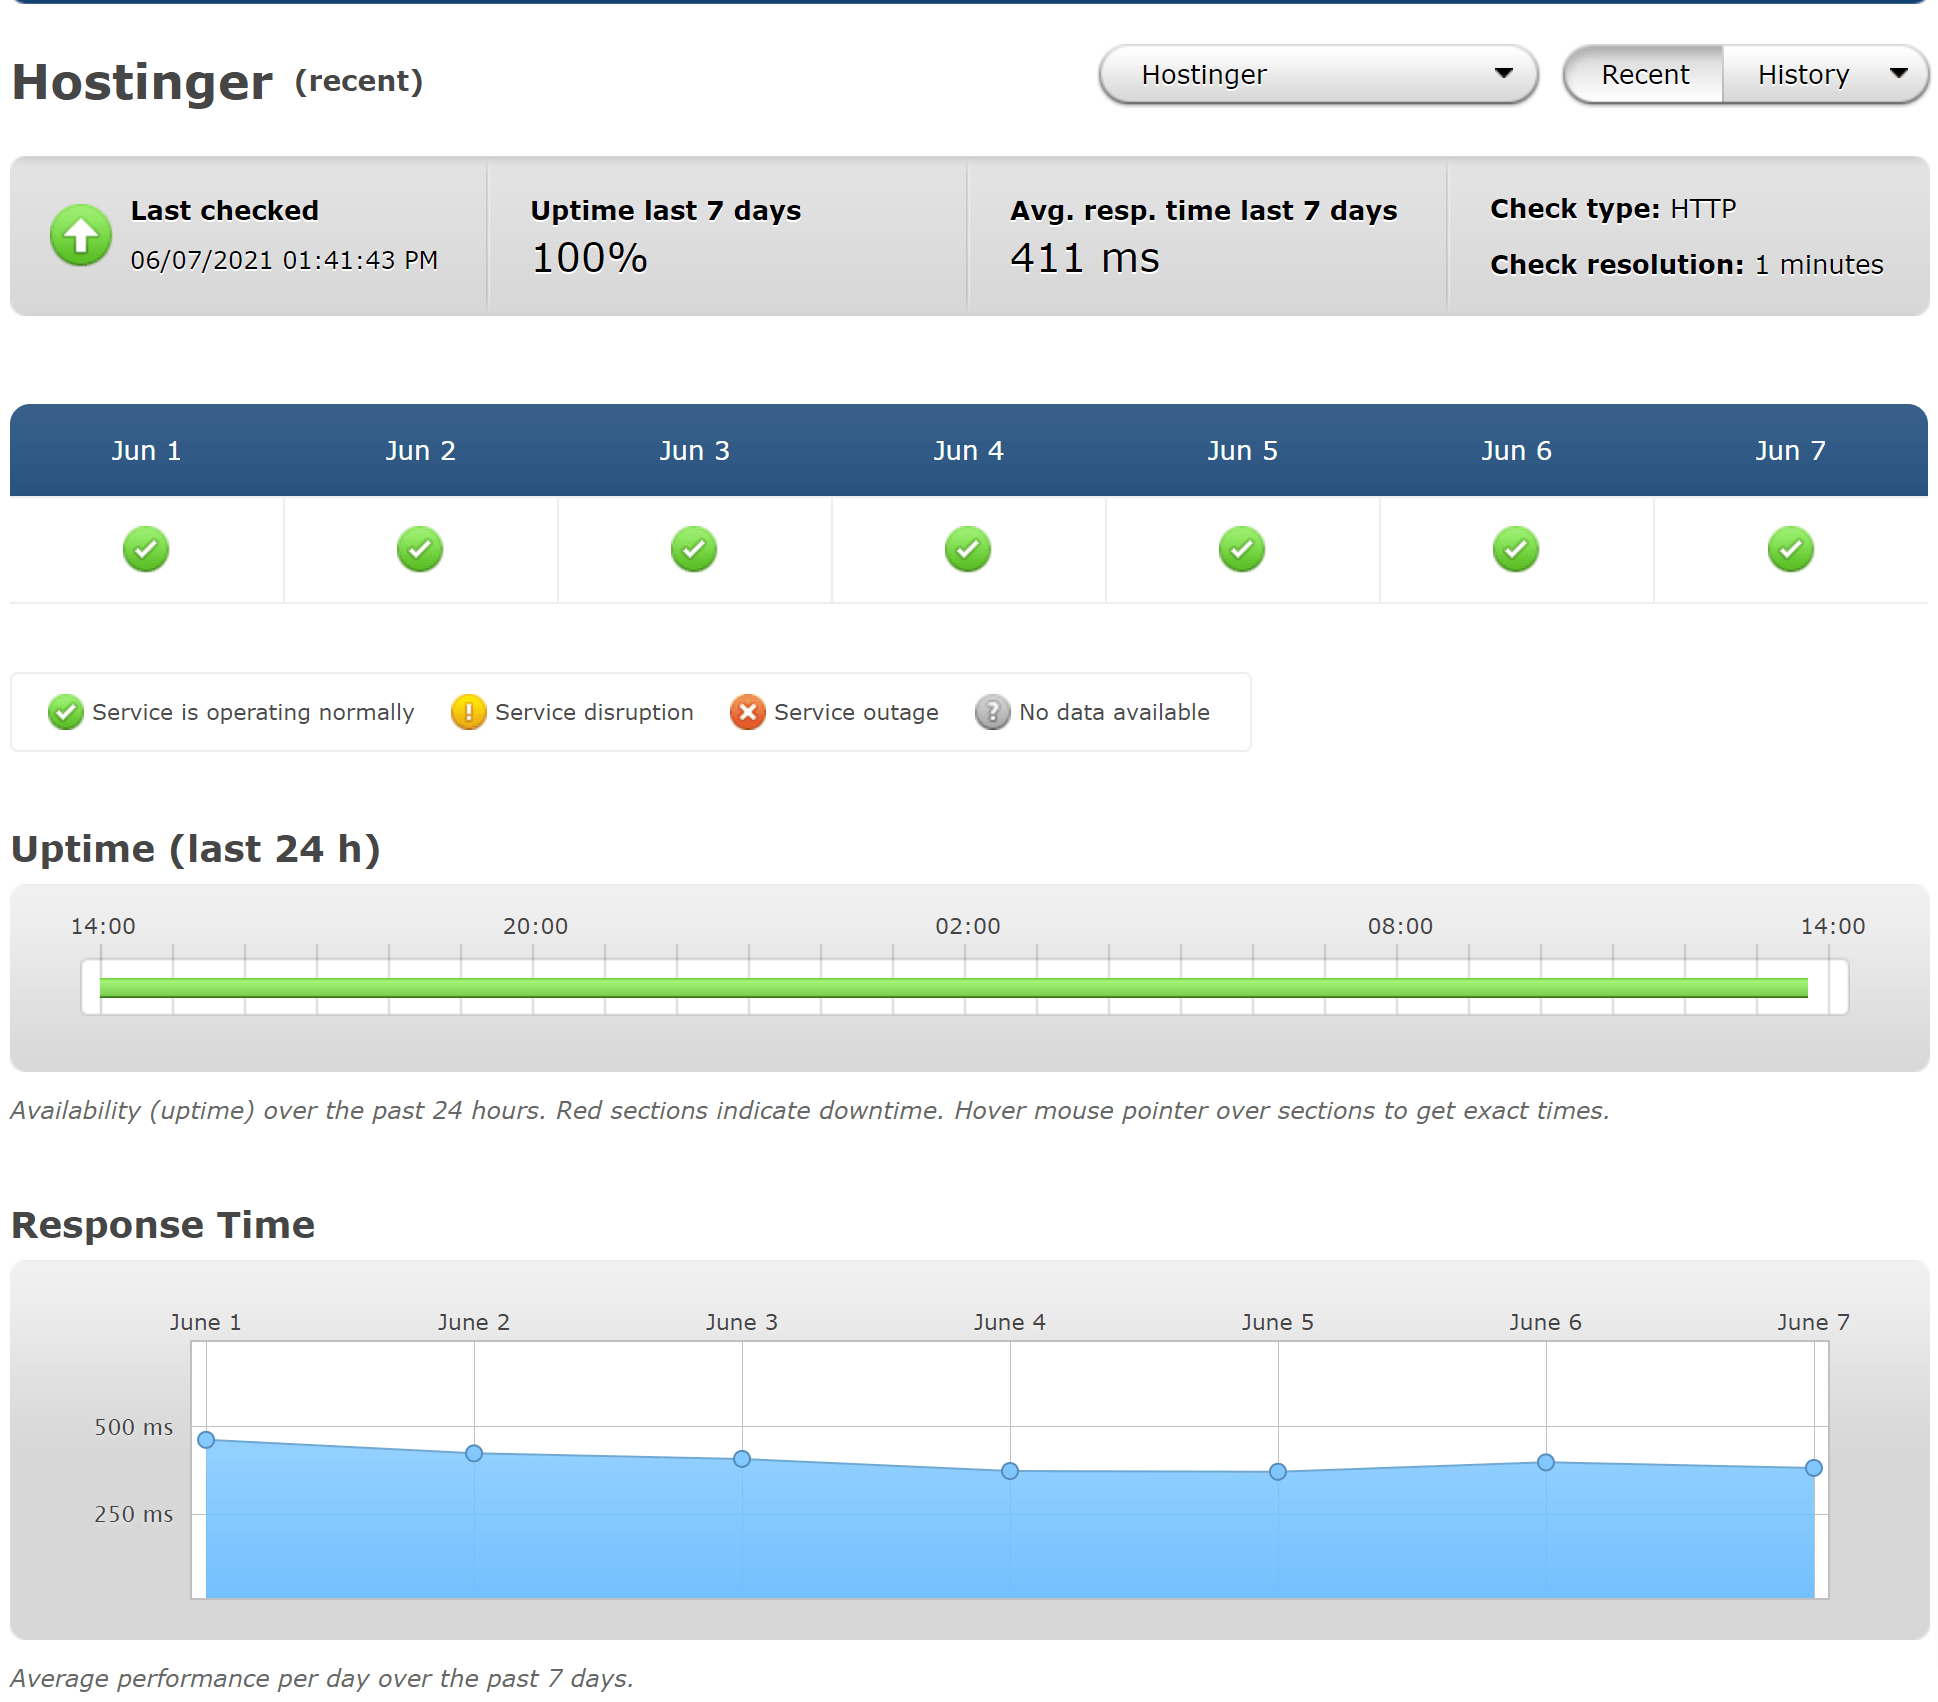 Hostinger hosting review-Hostinger pingdom stats and spped